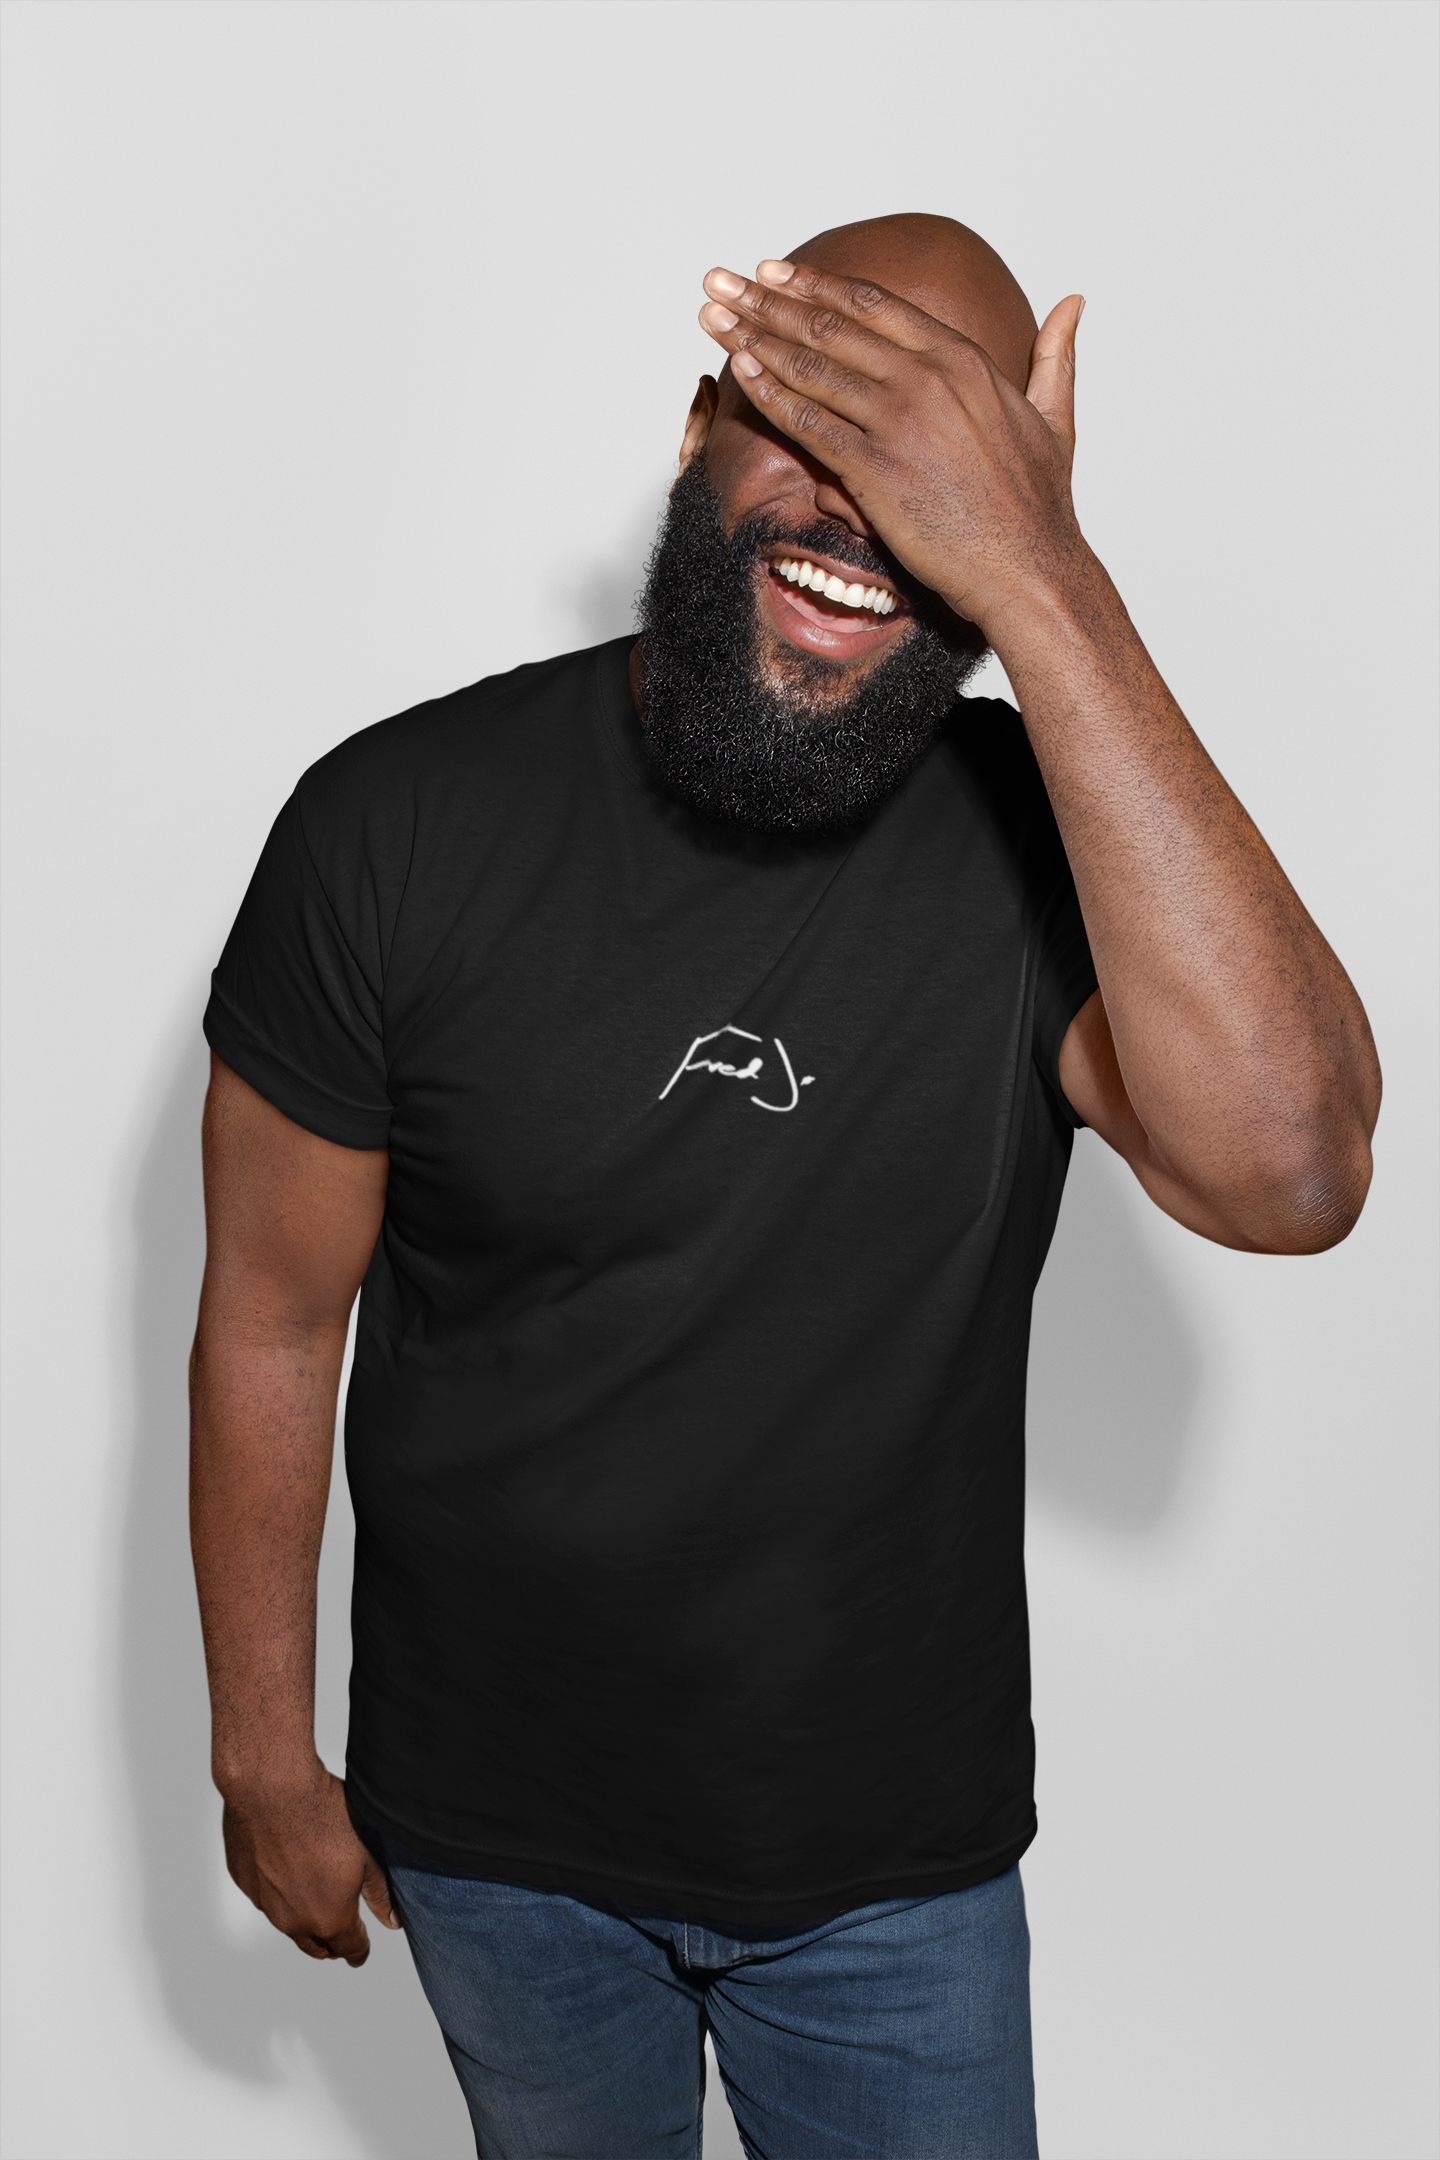 BuyMen's T-shirts Online, Online T-Shirt Store, Buy Organic Cotton T-Shirts